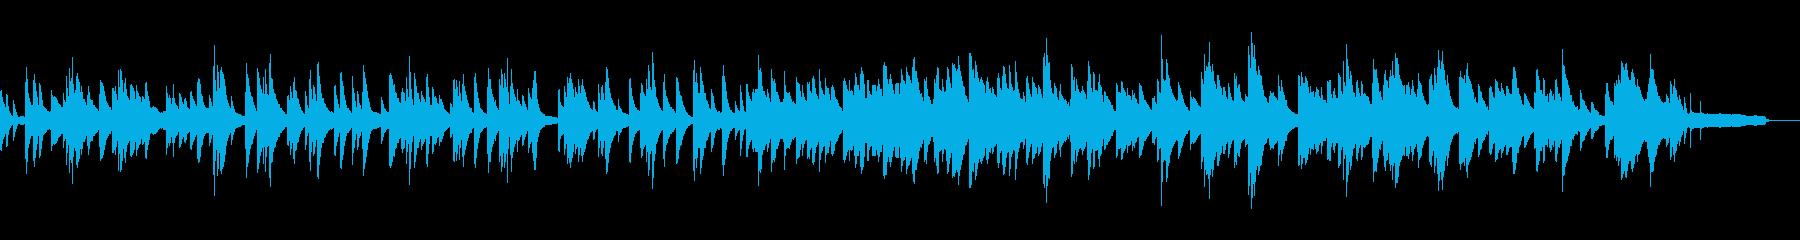 Cinematic Piano 6の再生済みの波形